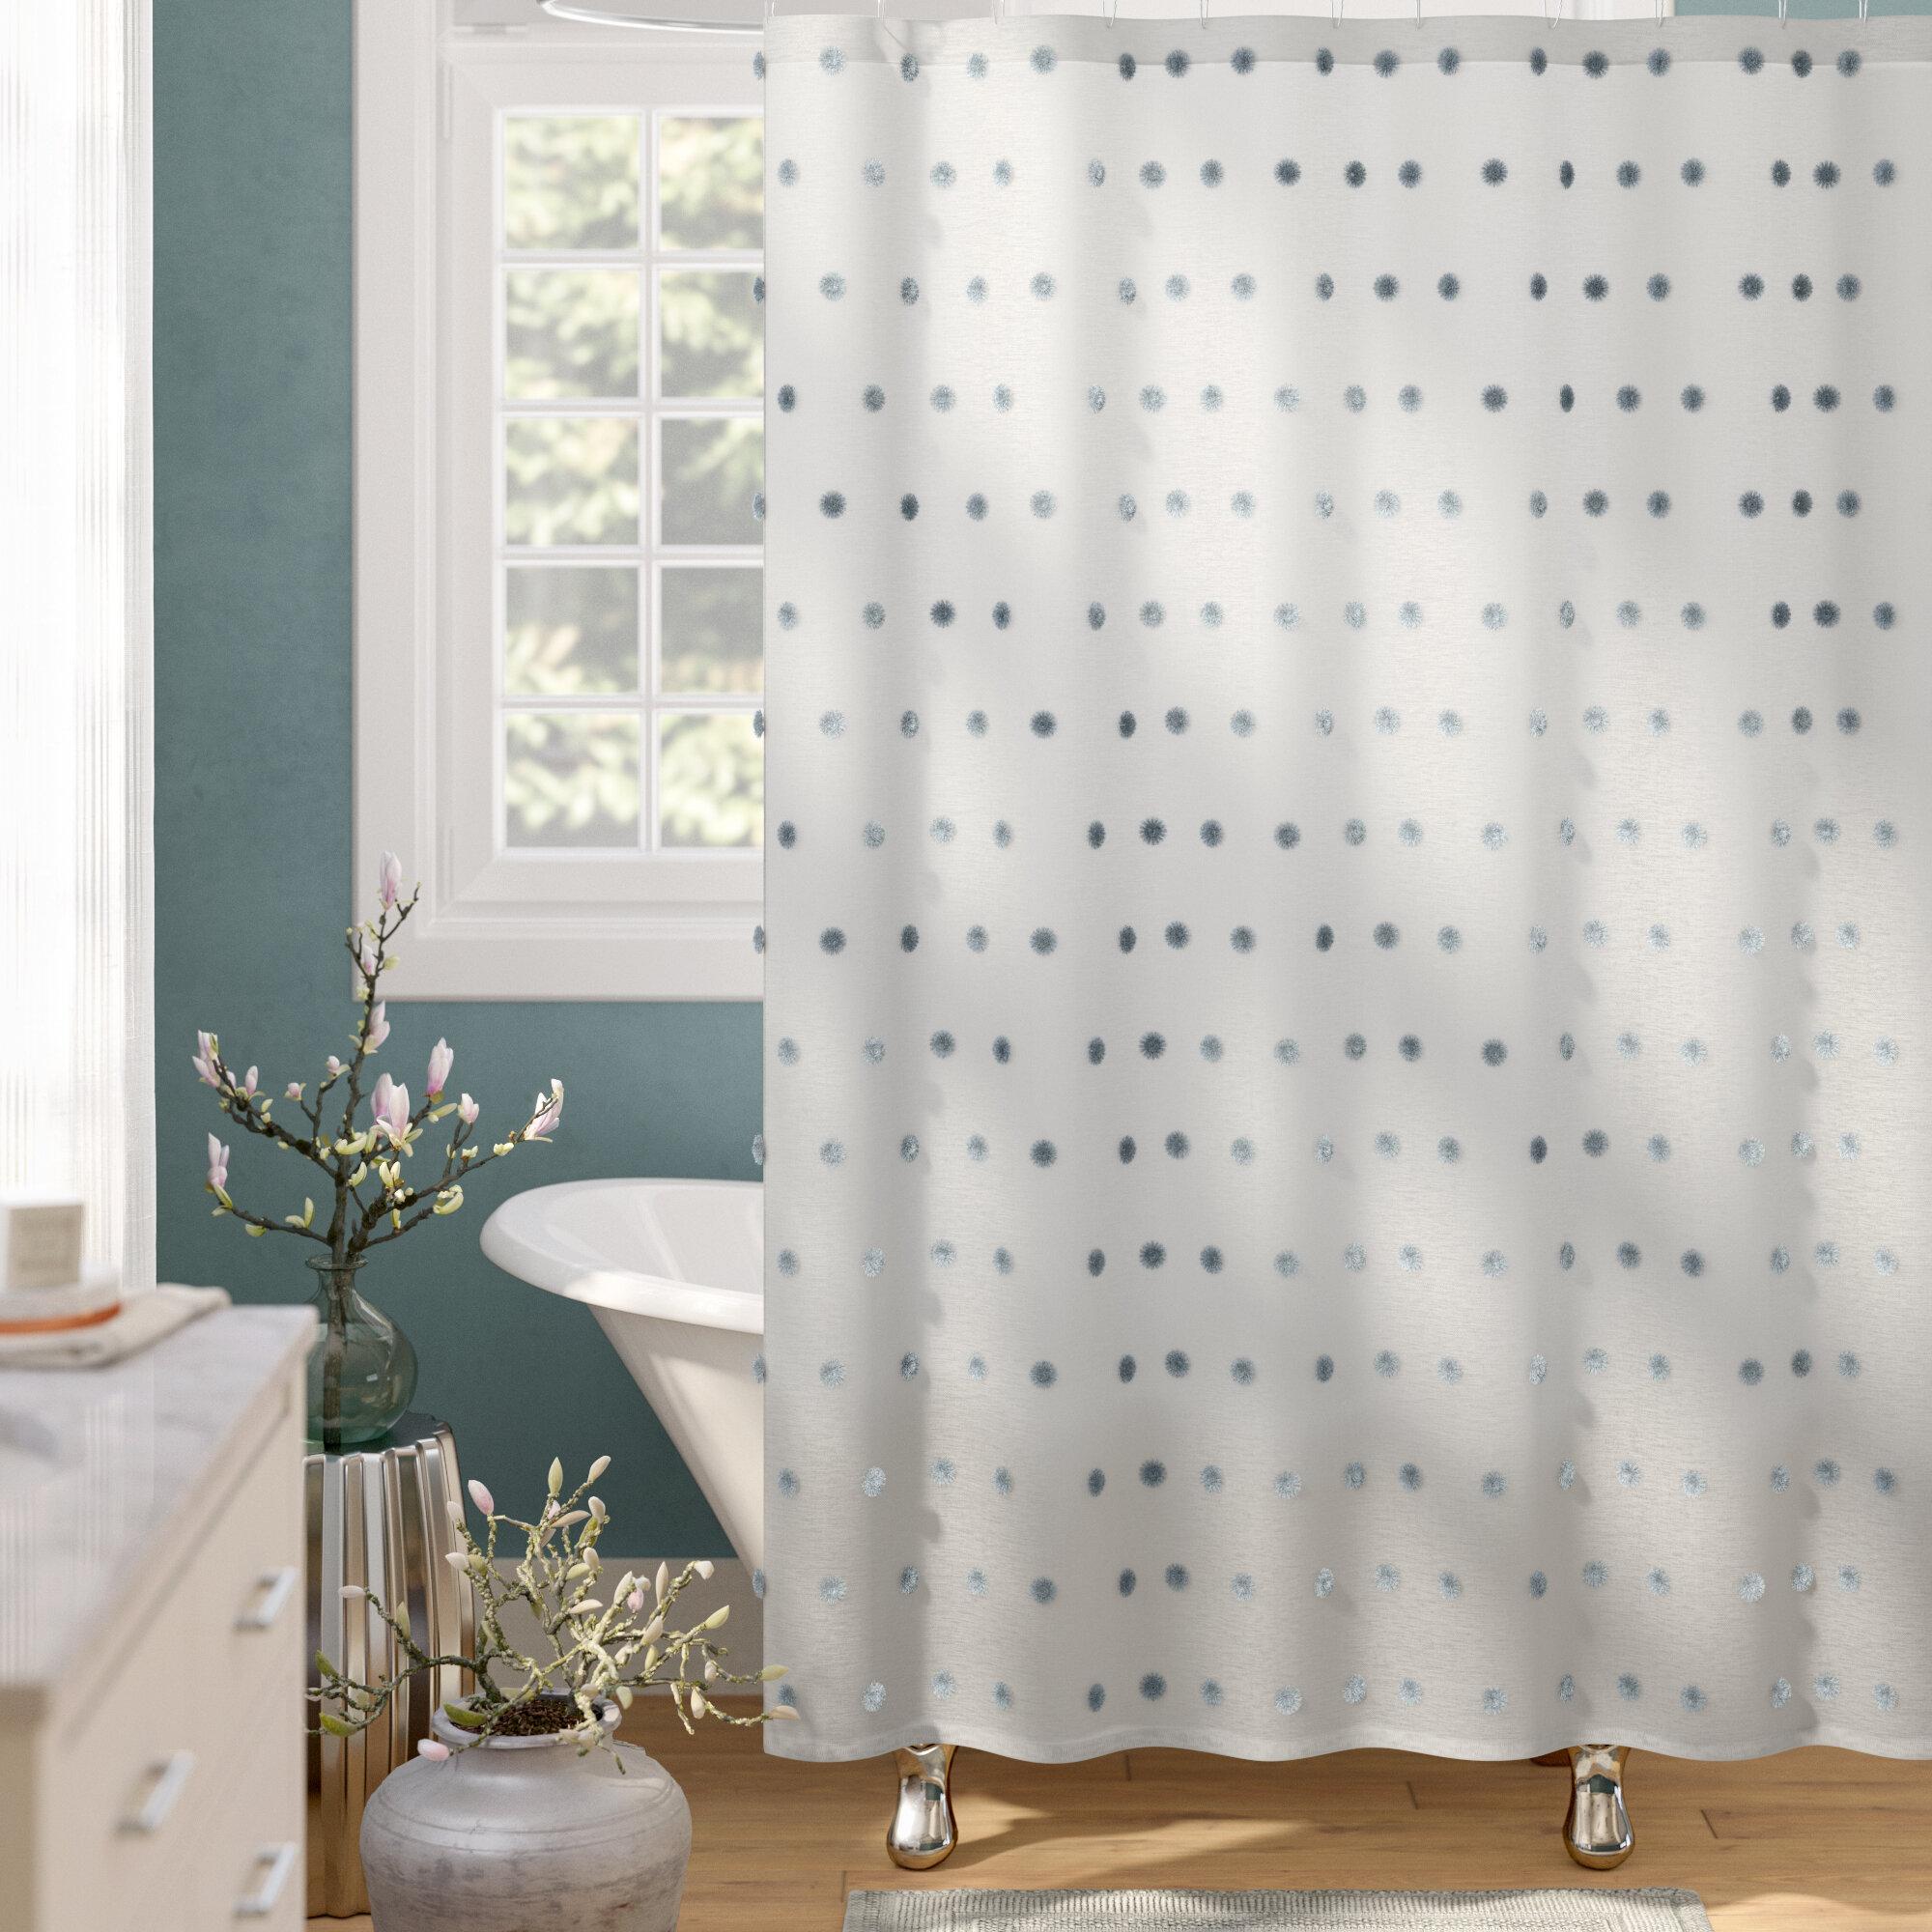 expand dark treatment splendor click gold pair to faux tailored shirred doors x curtain p window shower silk